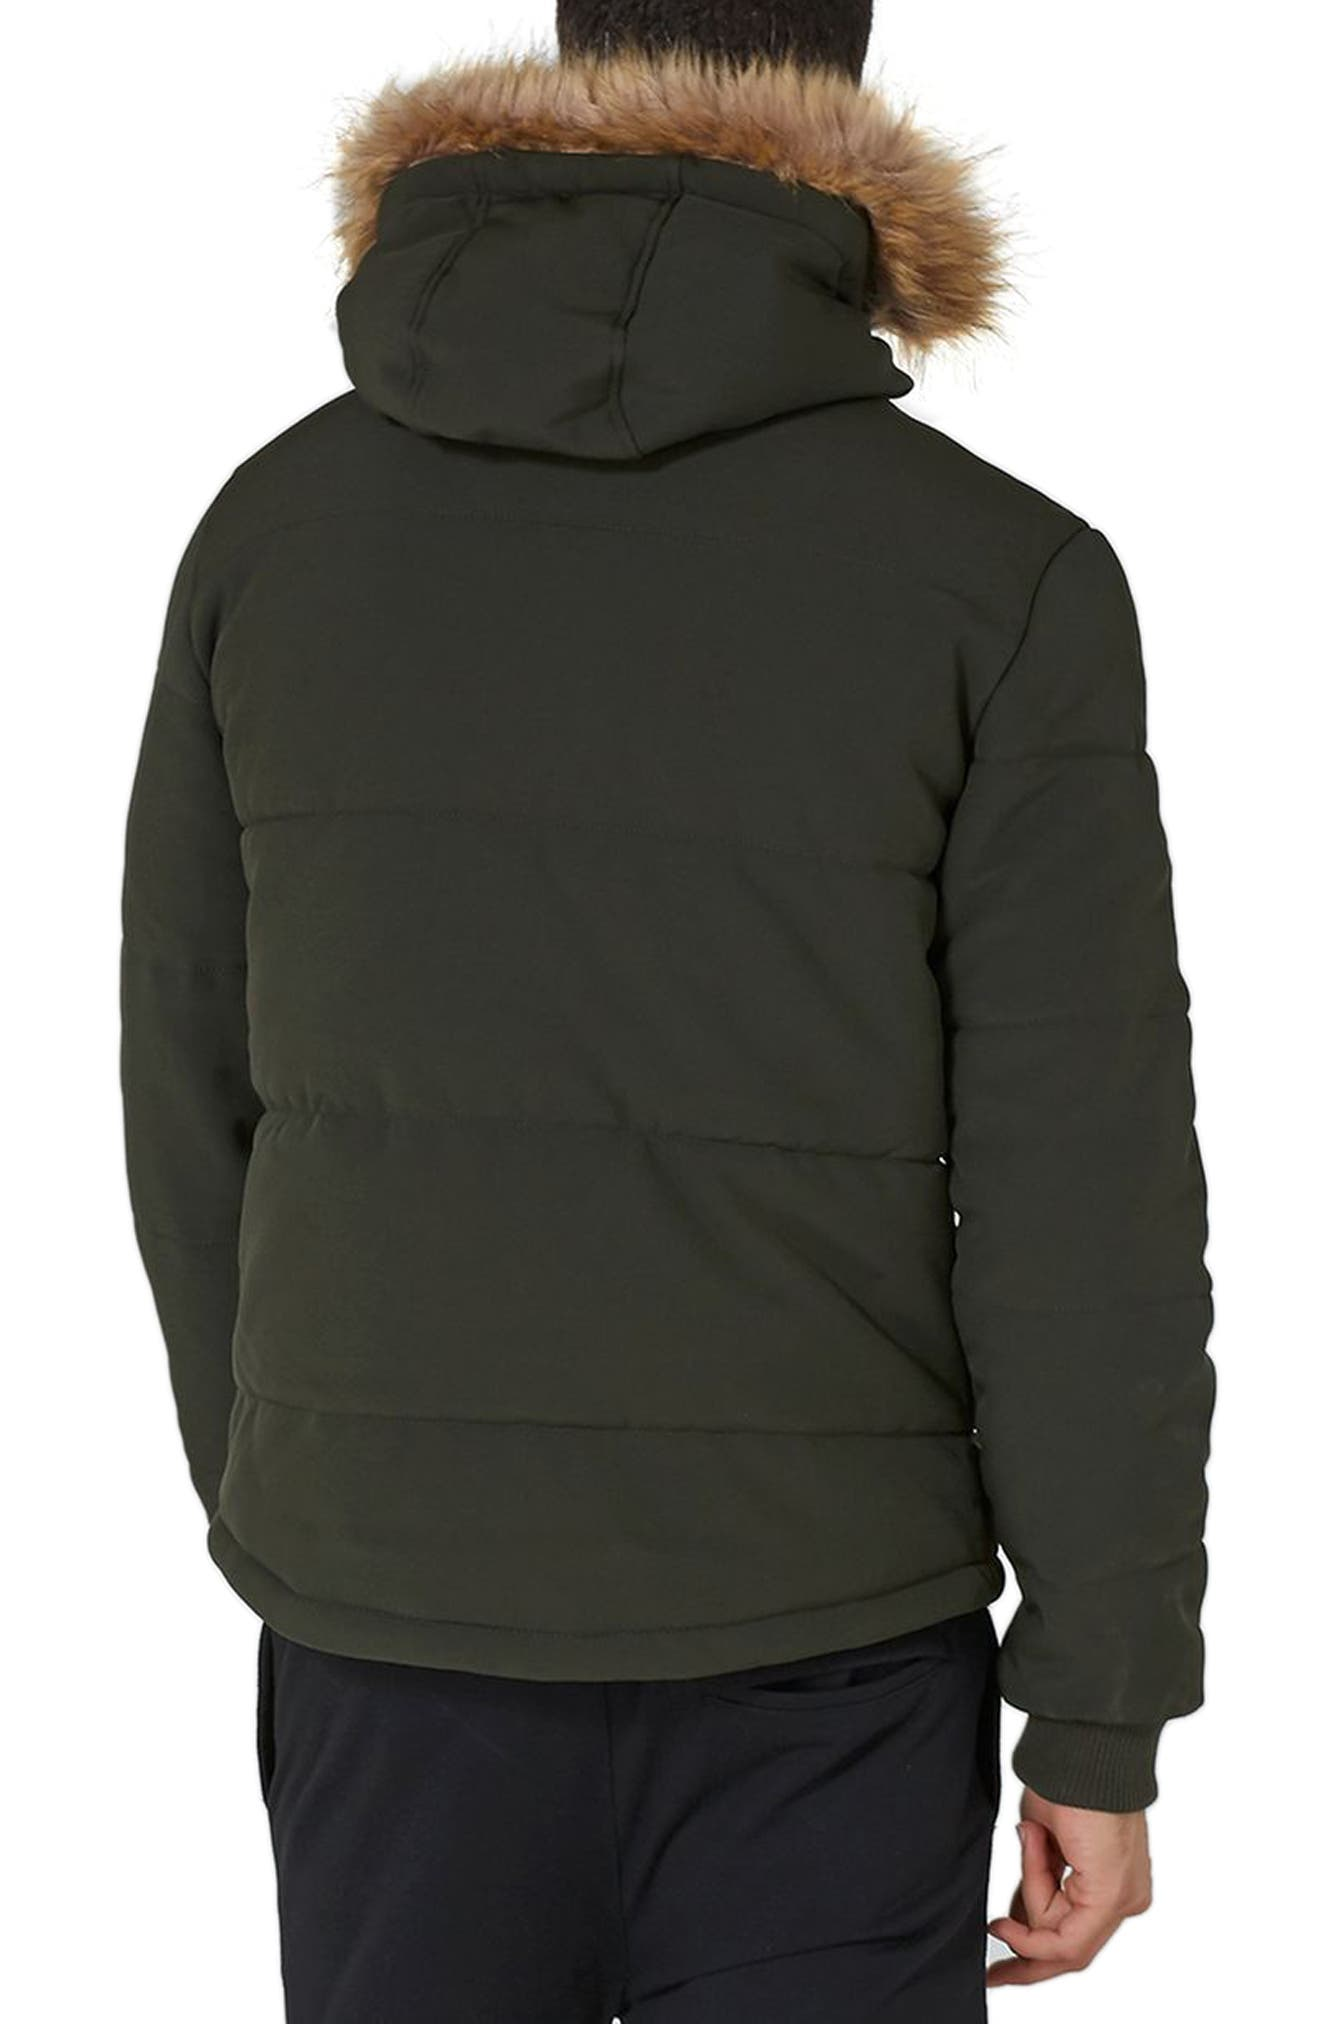 Maguire Faux Fur Trim Puffer Jacket,                             Alternate thumbnail 2, color,                             Green